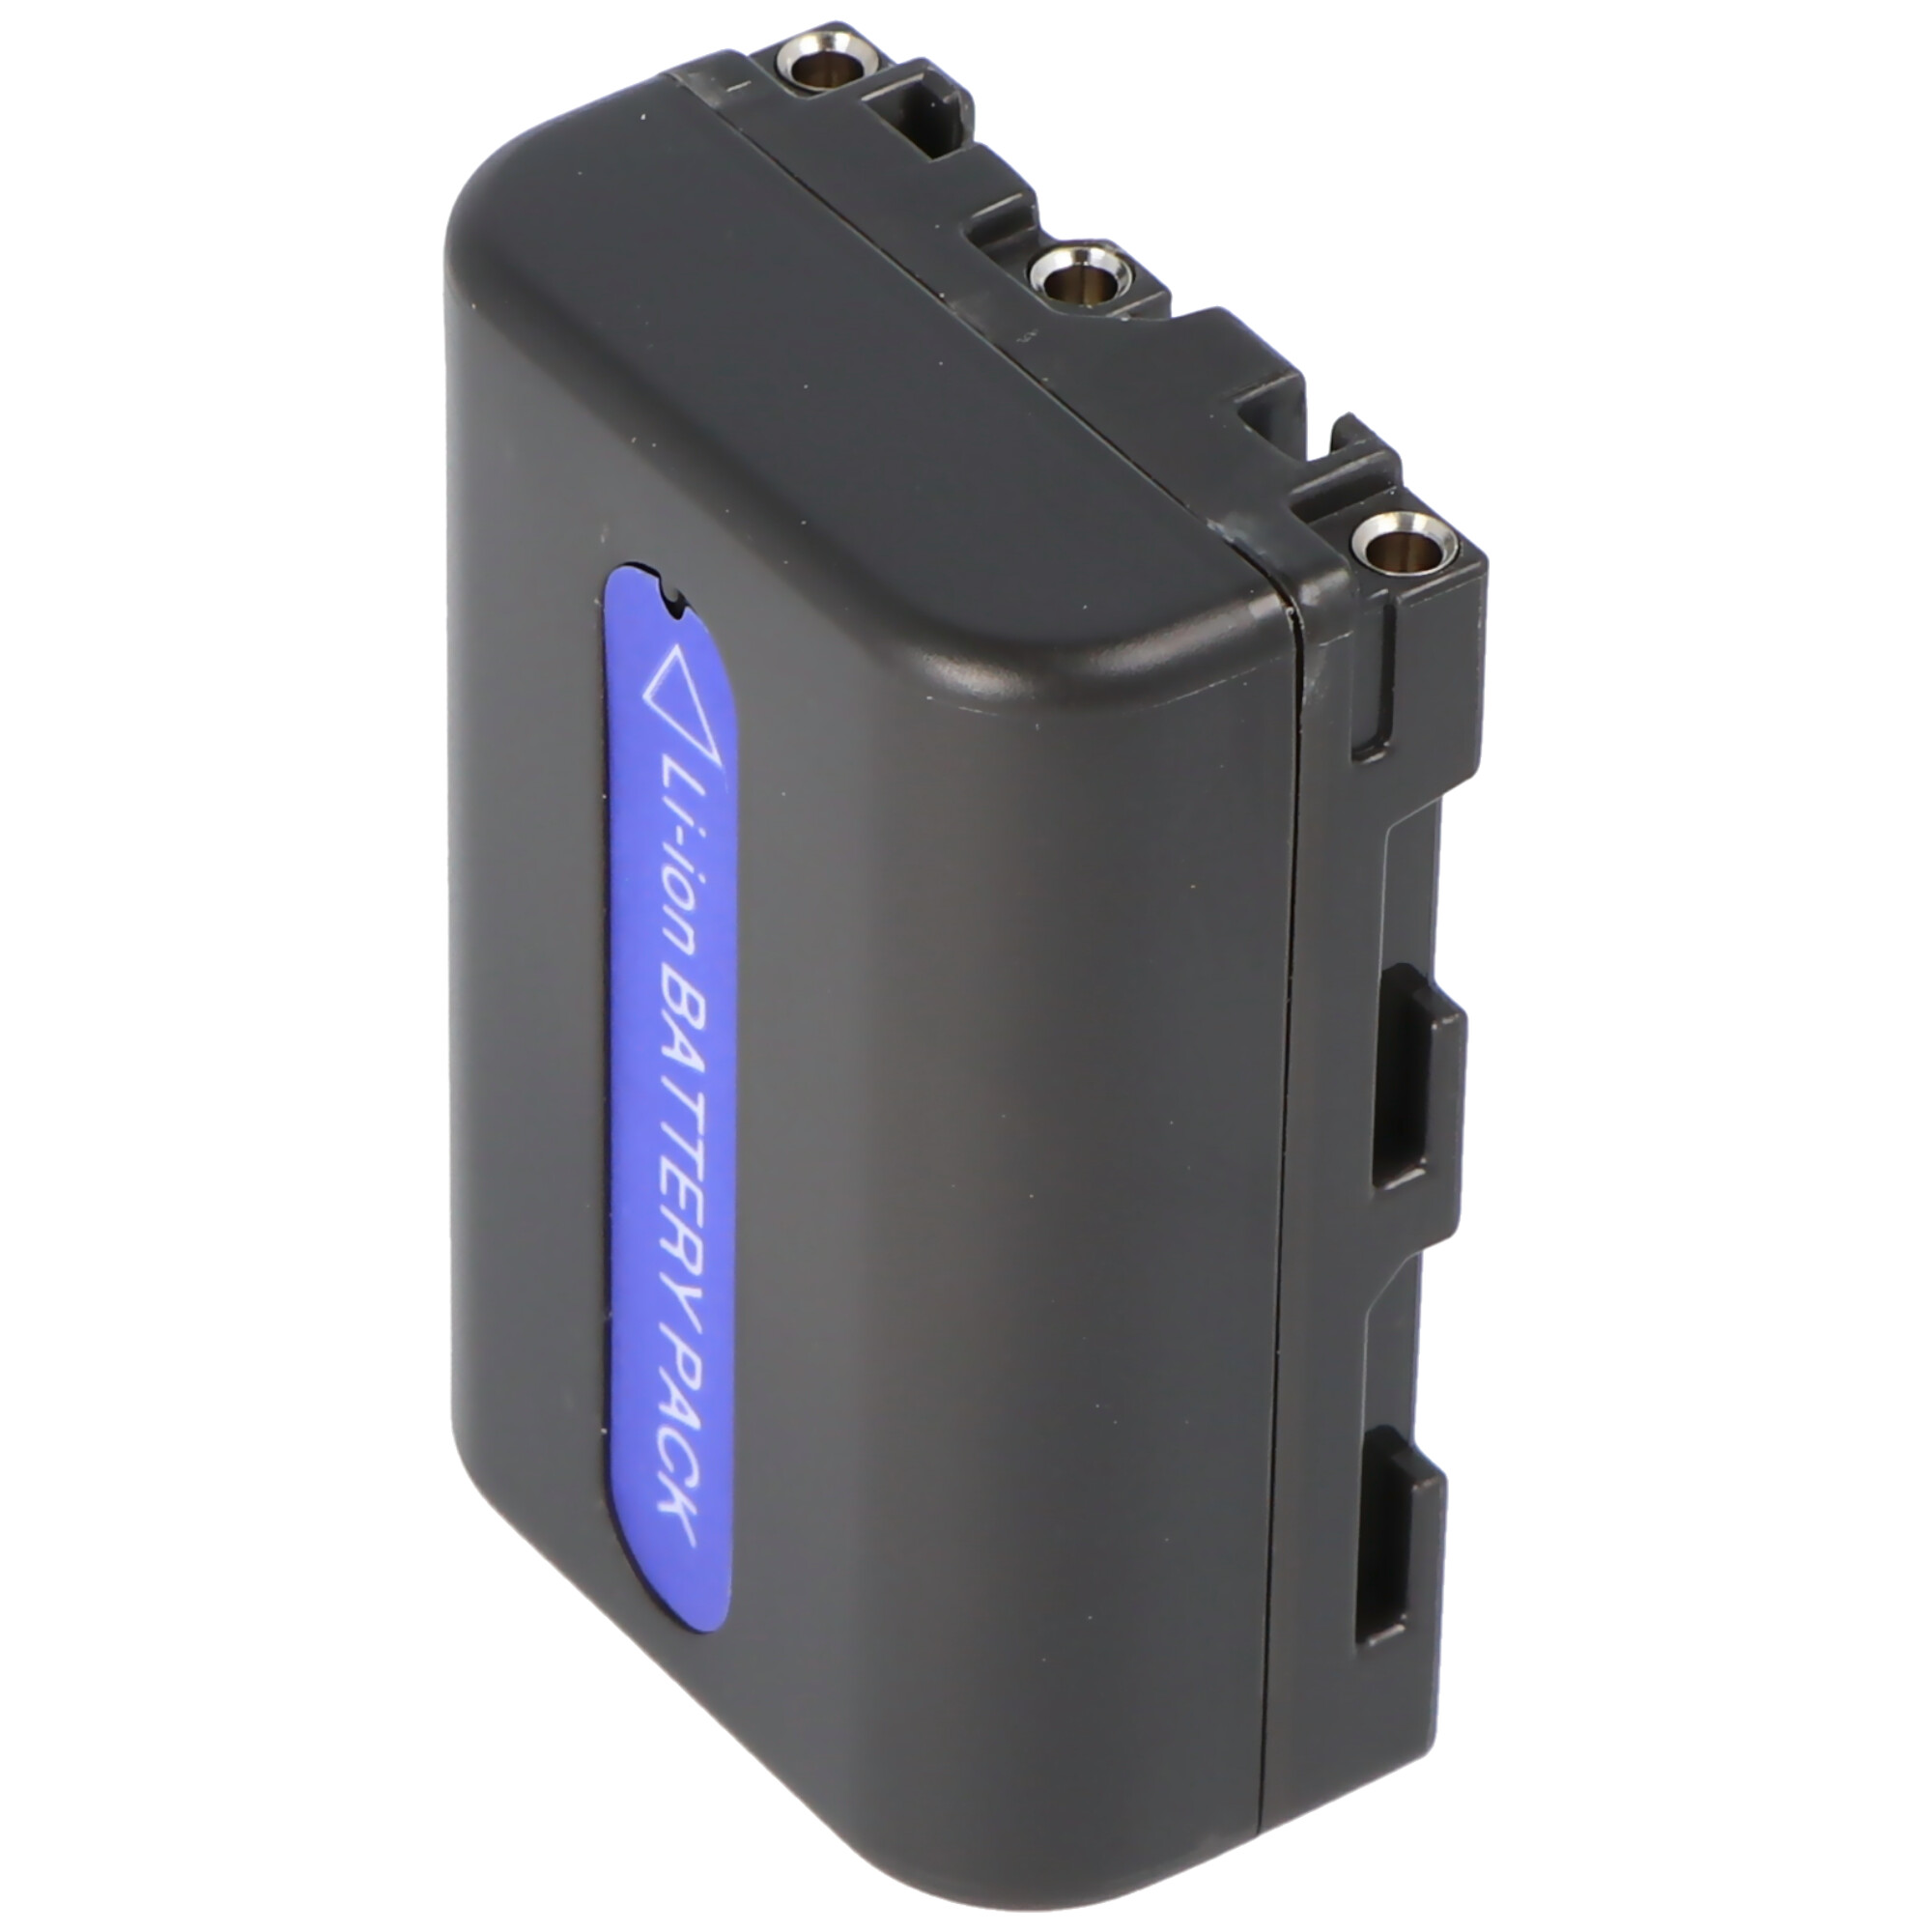 TRV330 NEU Kabel TRV245E USB TRV240 Datenkabel für SONY DCR TRV238E